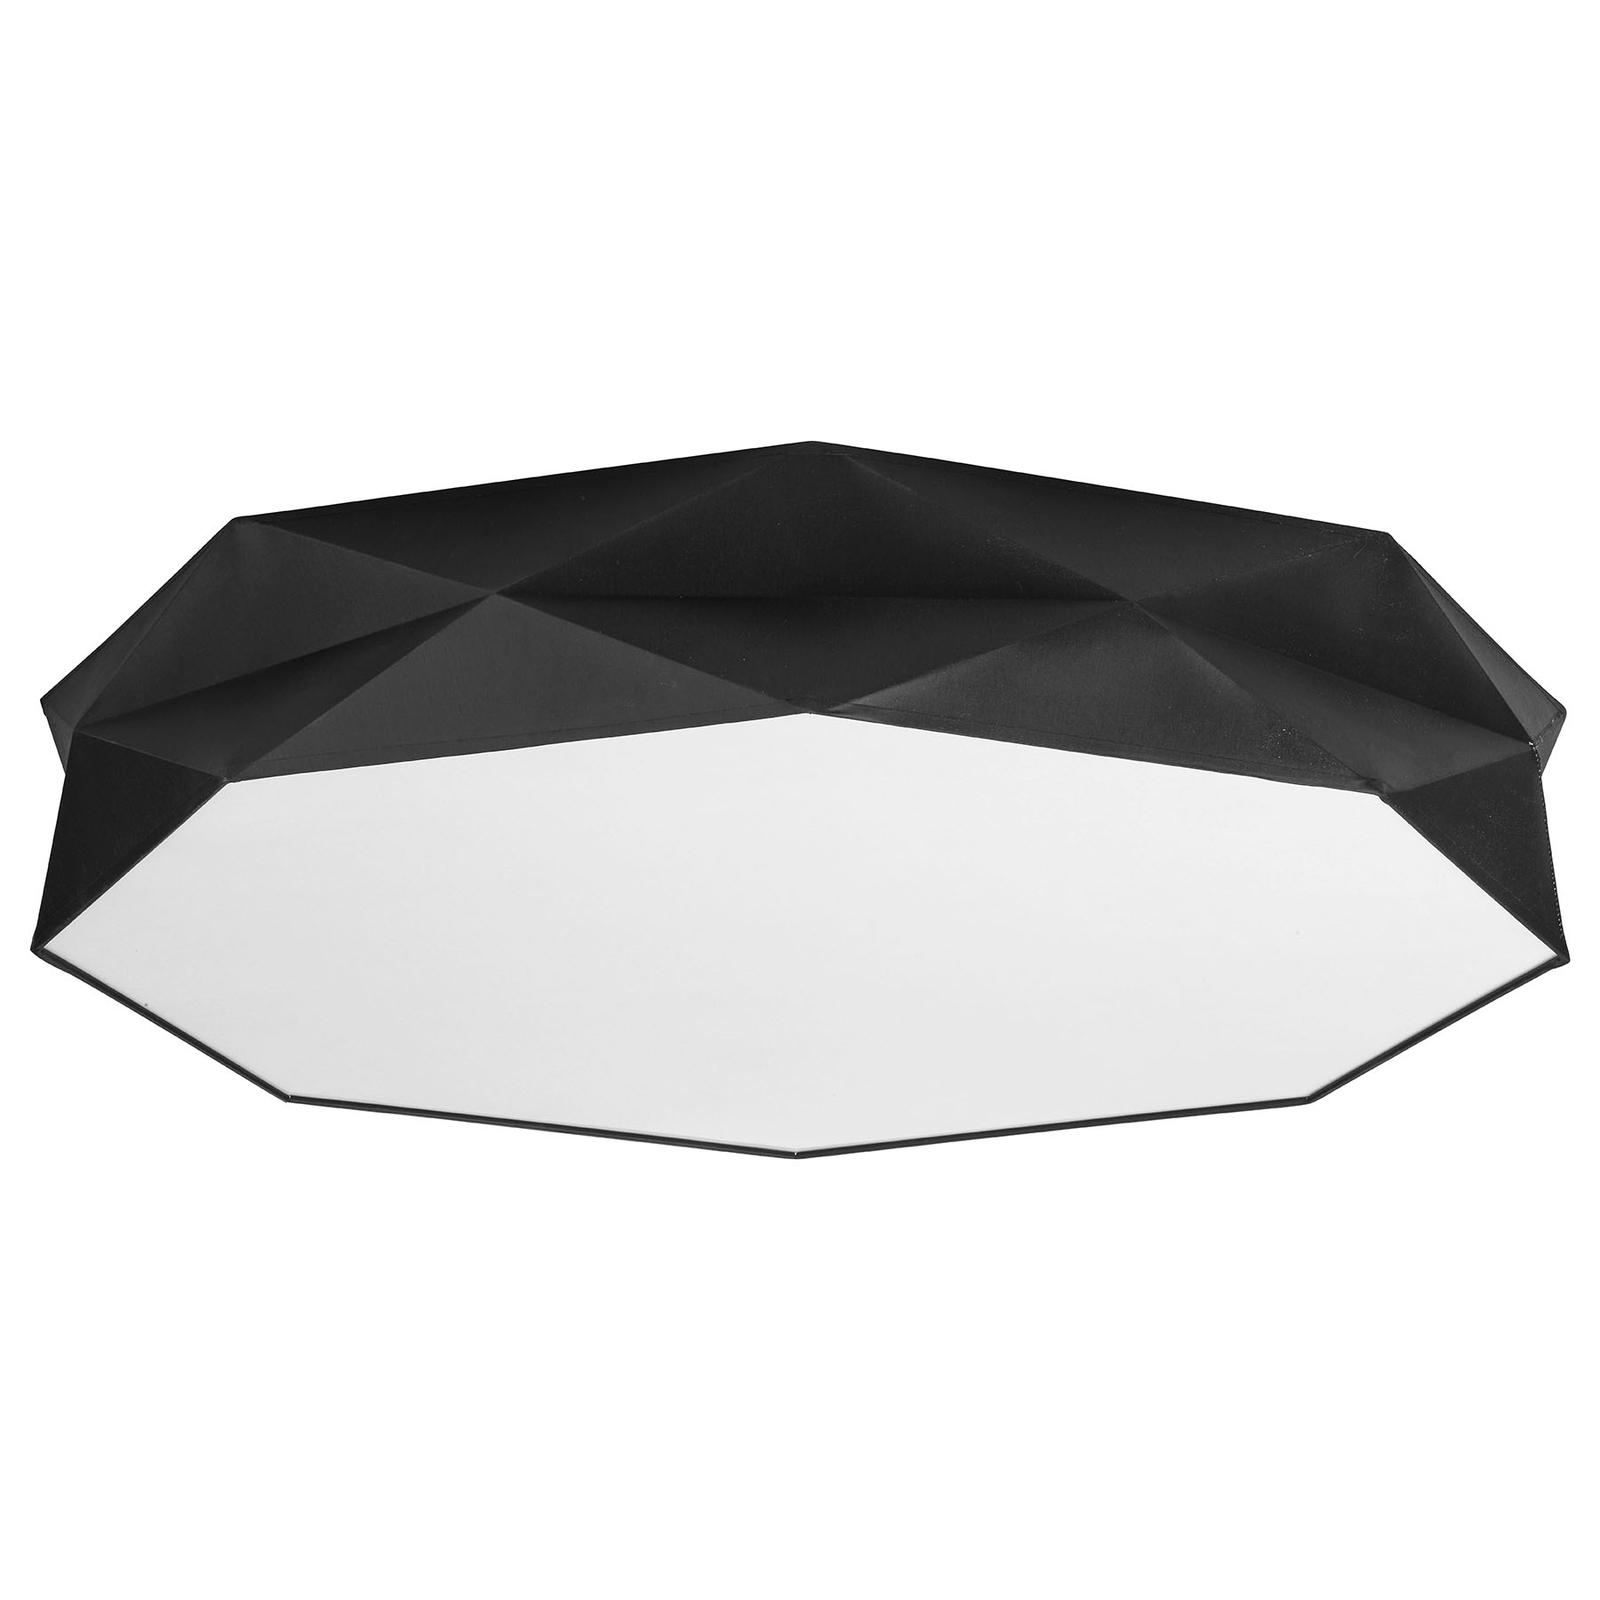 Taklampe Kantoor New, Ø 88 cm, hvit/svart